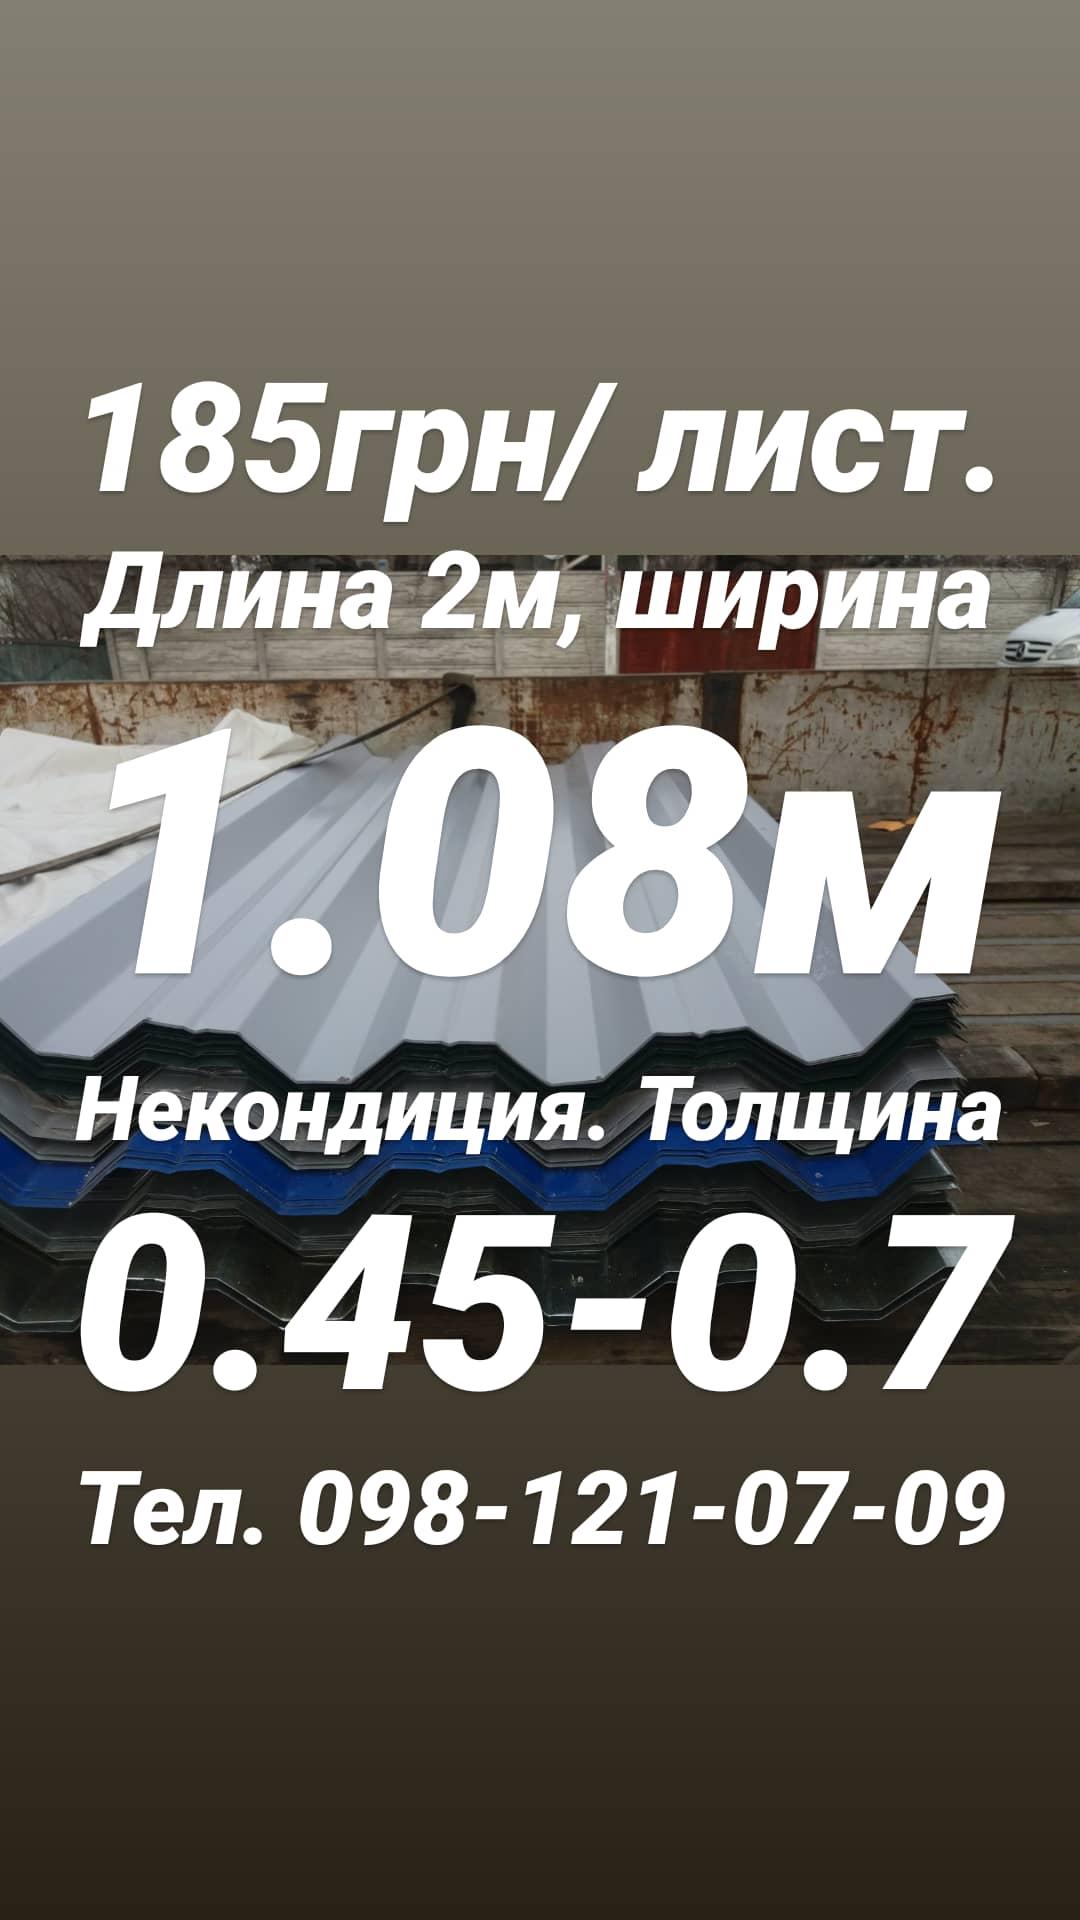 IMG_20200220_091628_897